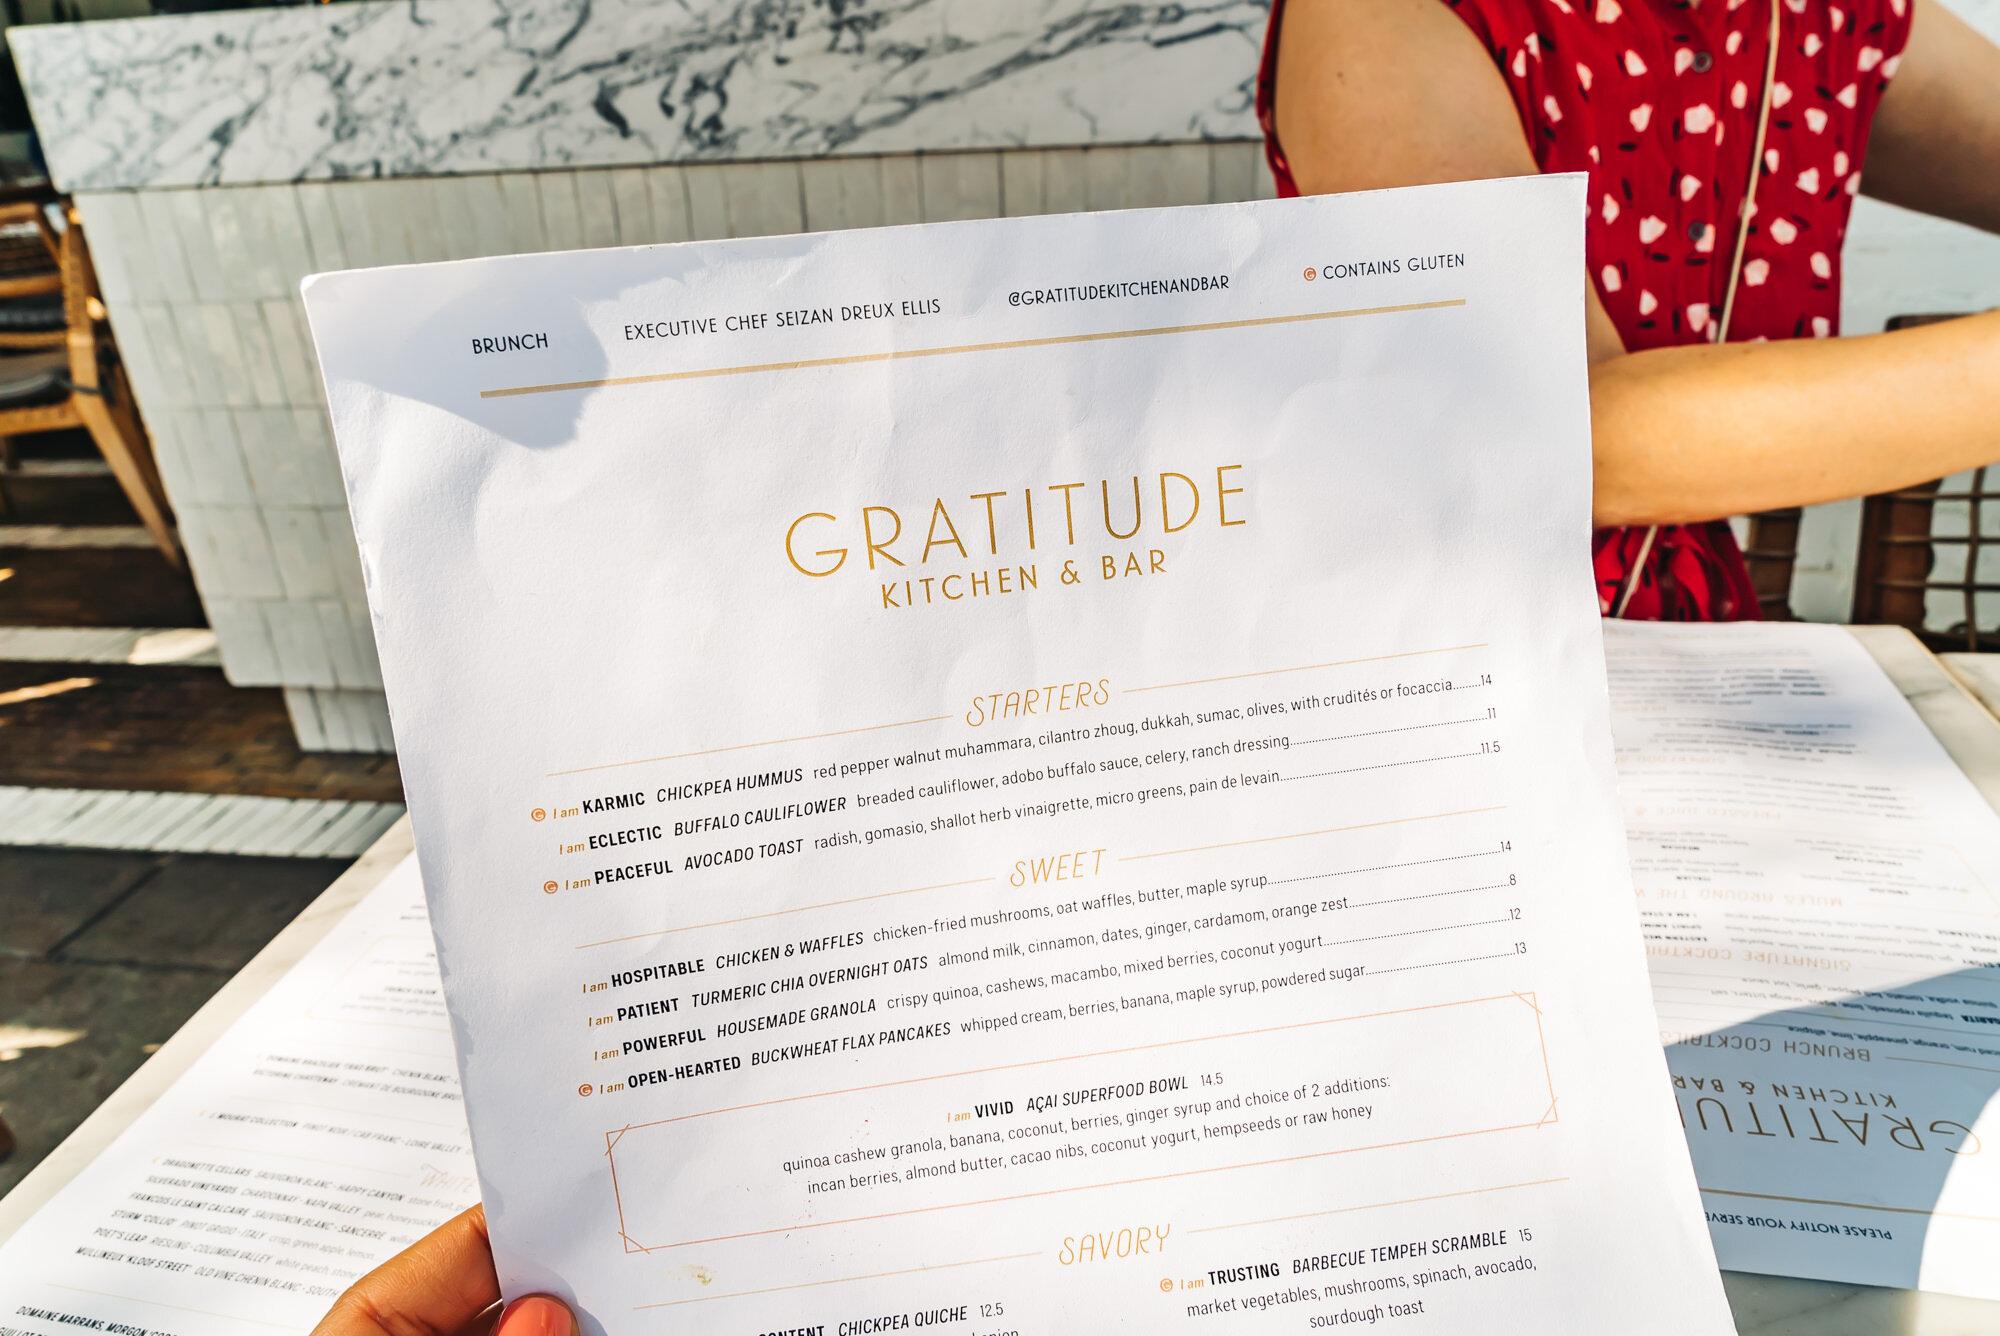 Cafe Gratitude Kitchen & Bar + www.thetravelpockets.com